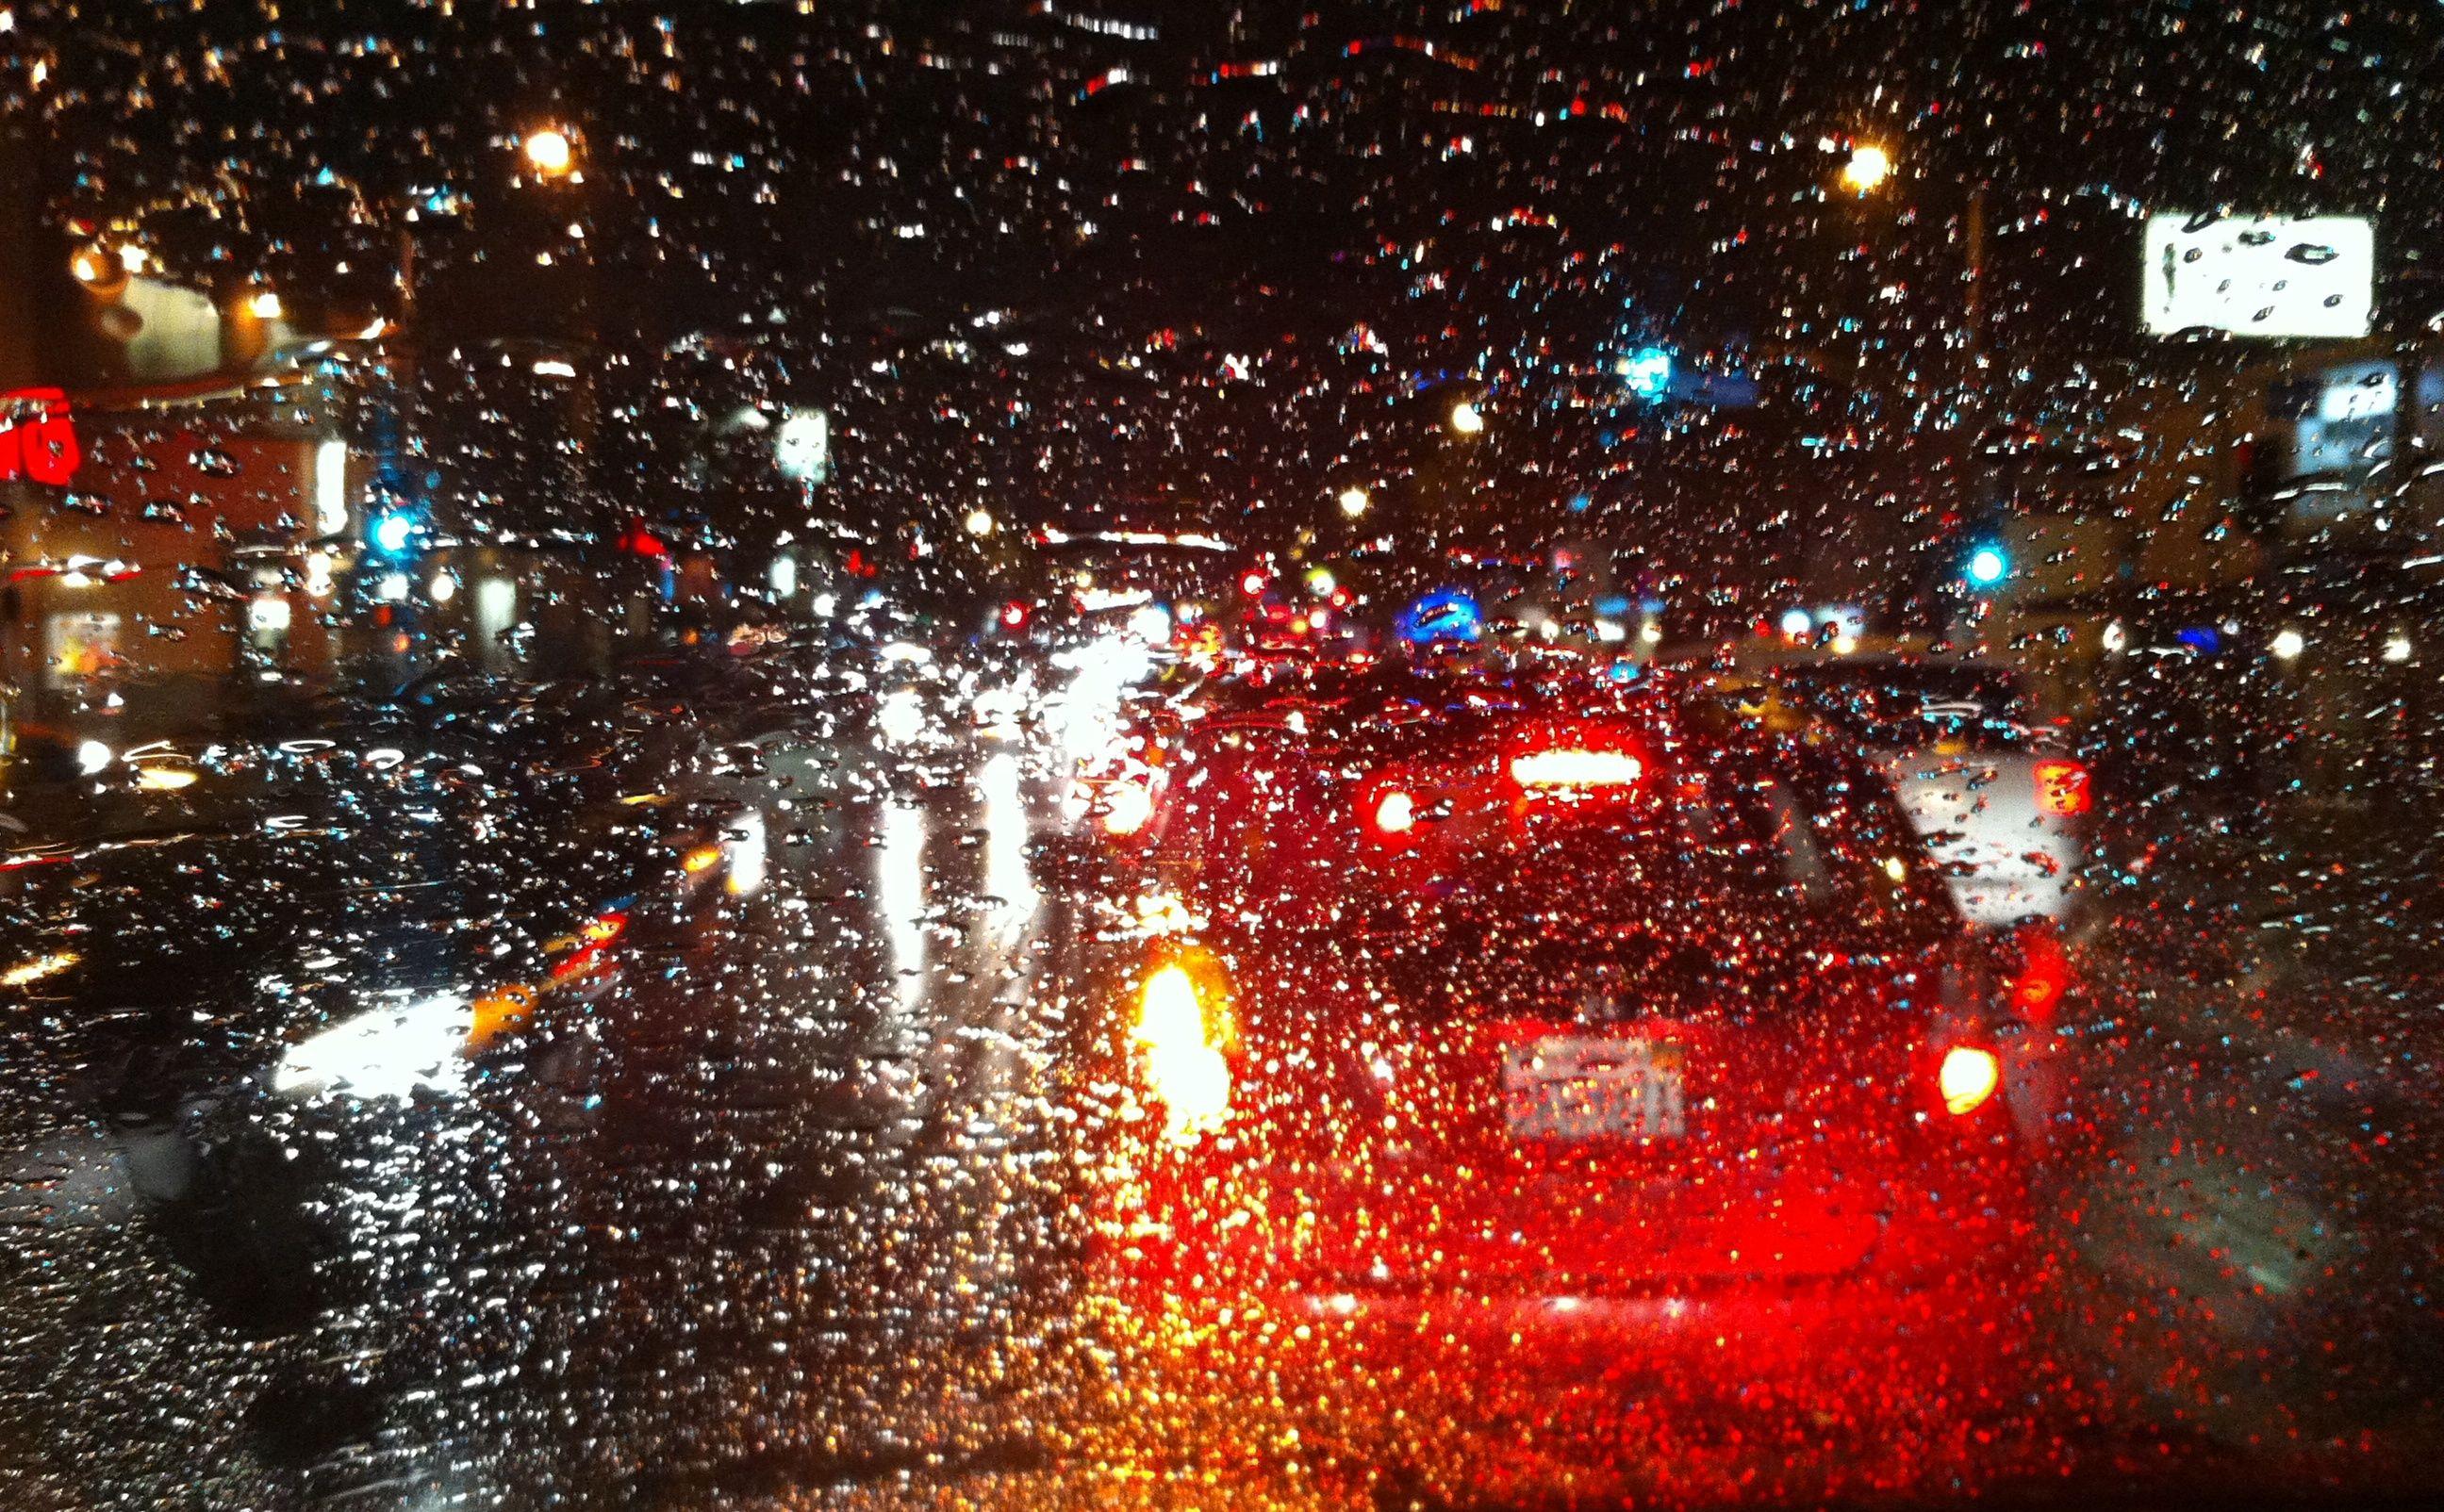 Rain, Sherman Oaks 2013